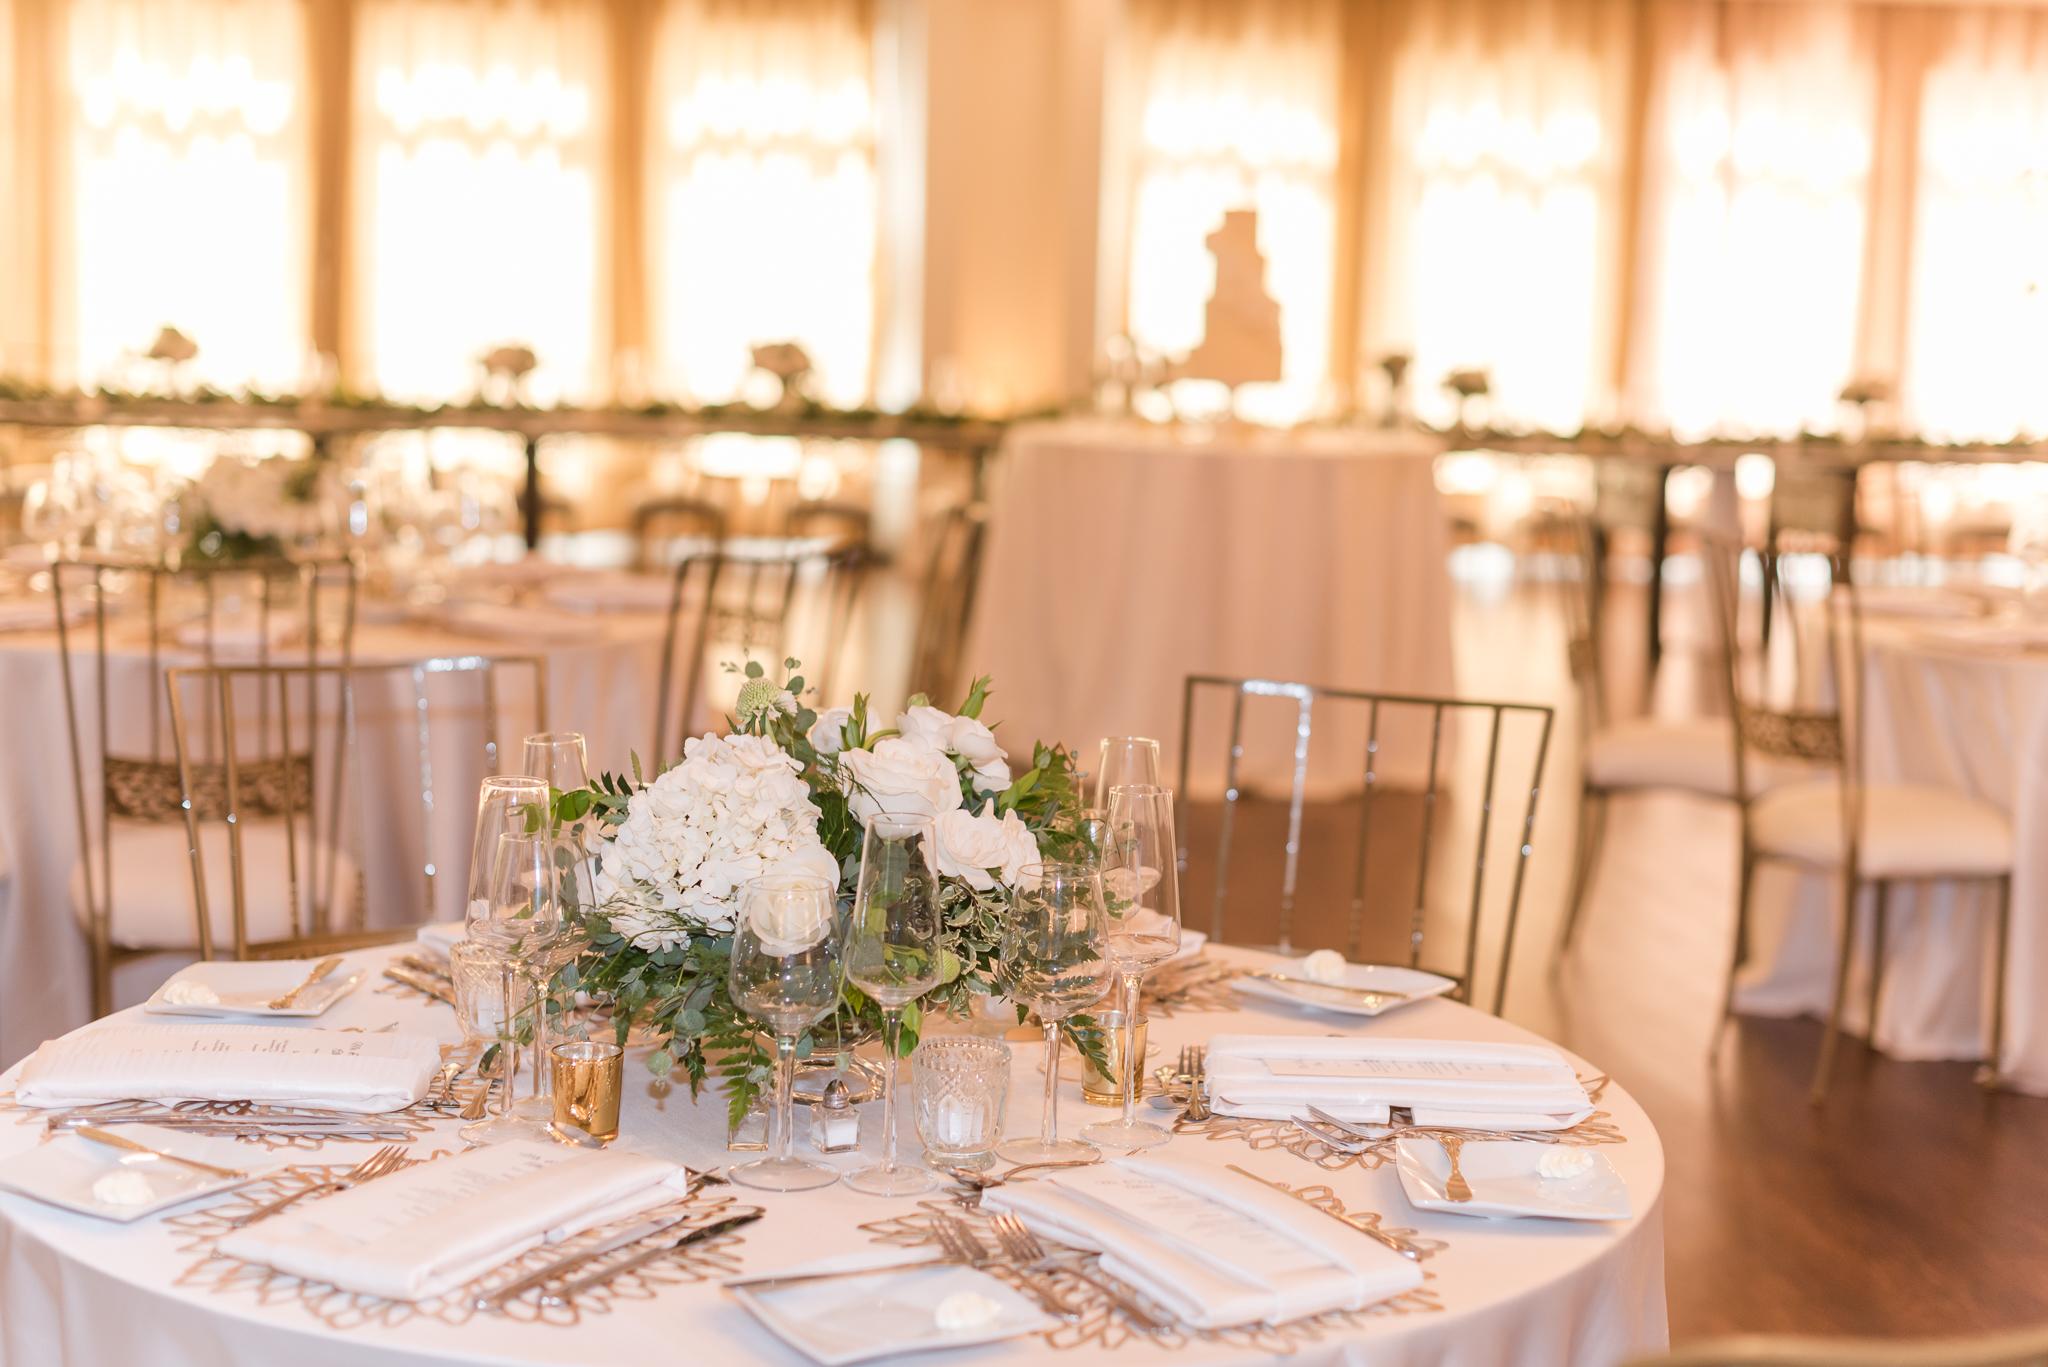 Black Iris Estate Wedding Elegant White with Greenery Luxury High End Flowers-19.jpg